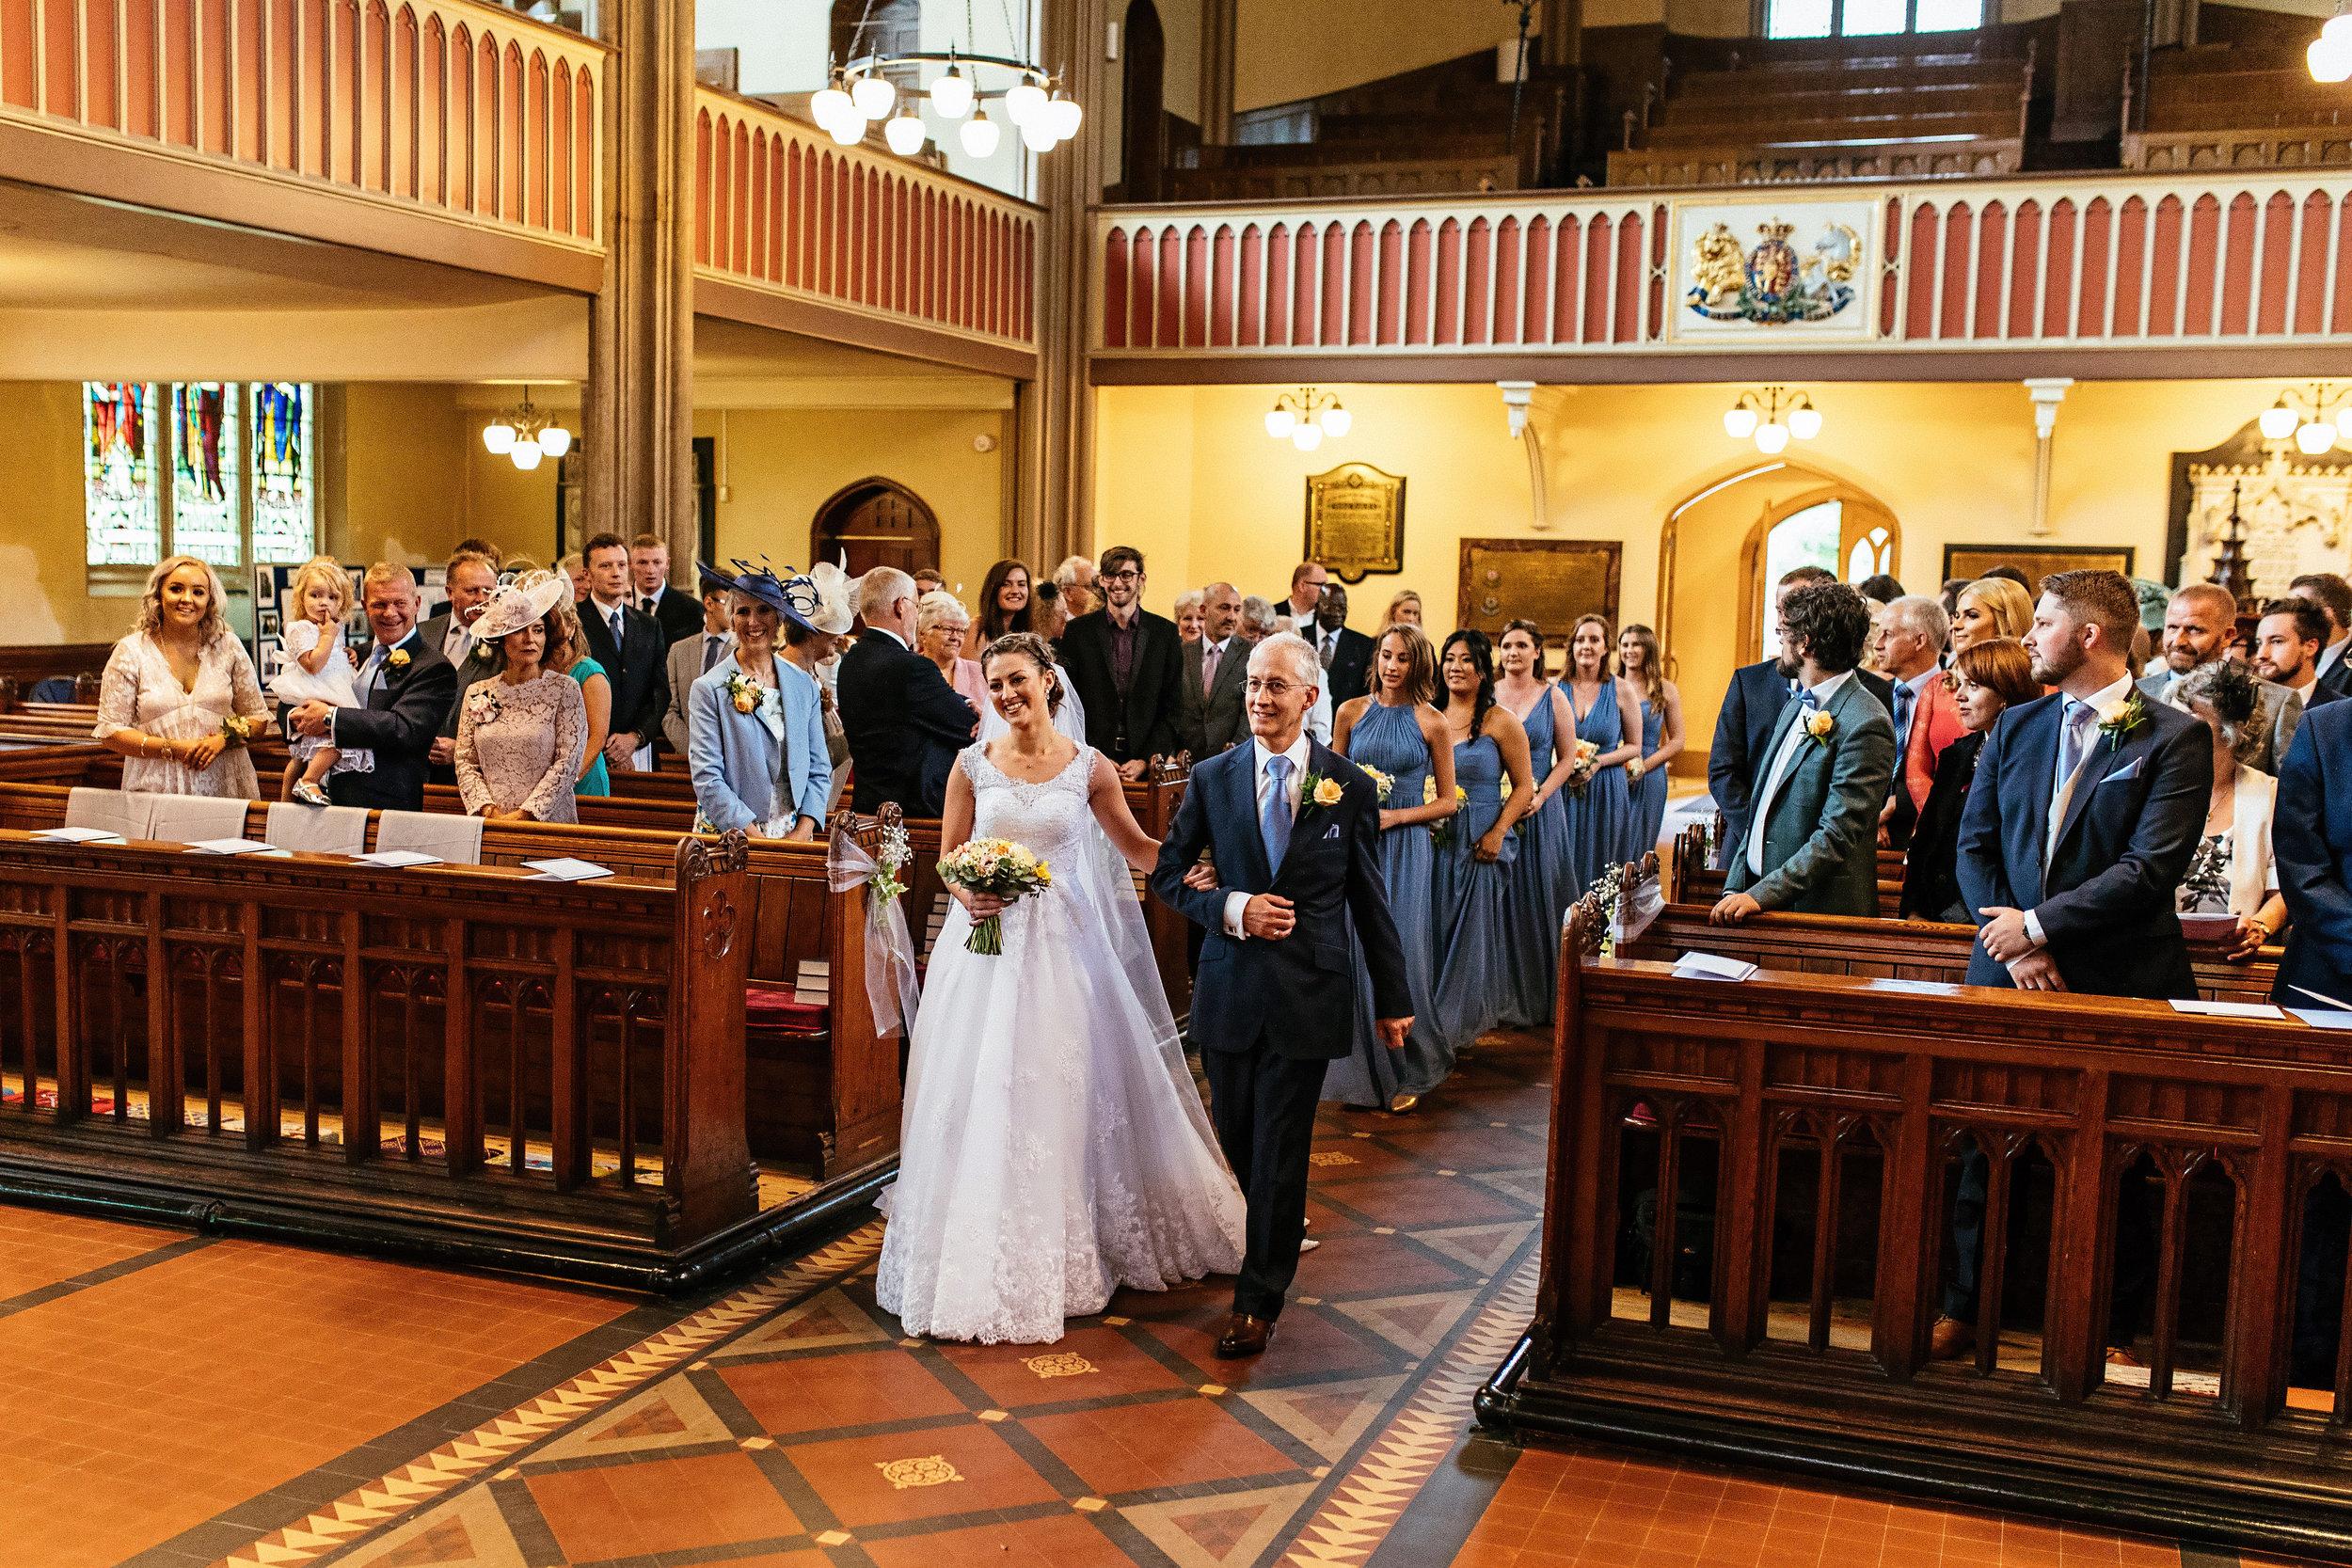 Kathryn-and-Mike-Wedding-Highlights-20.jpg